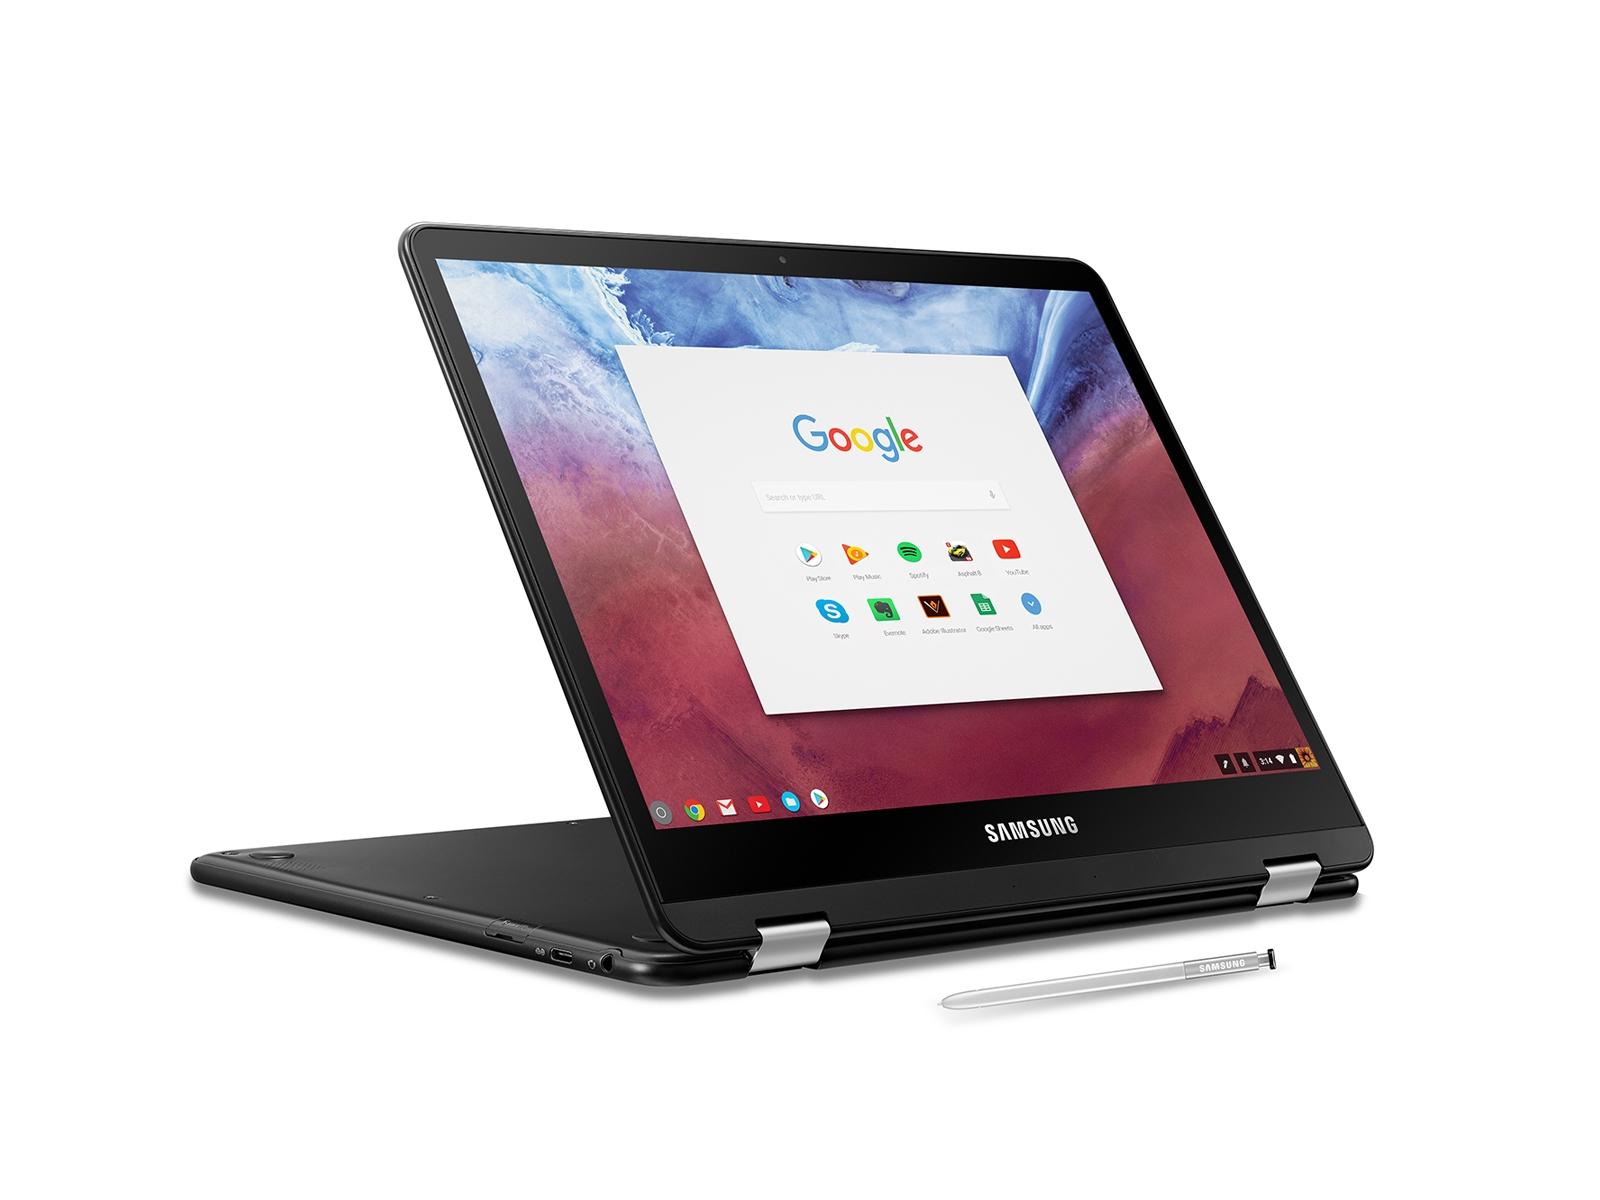 Samsung Chromebook Pro Xe510c24 K01us Us Prospeed Black Series Yamaha Vixion Old Full